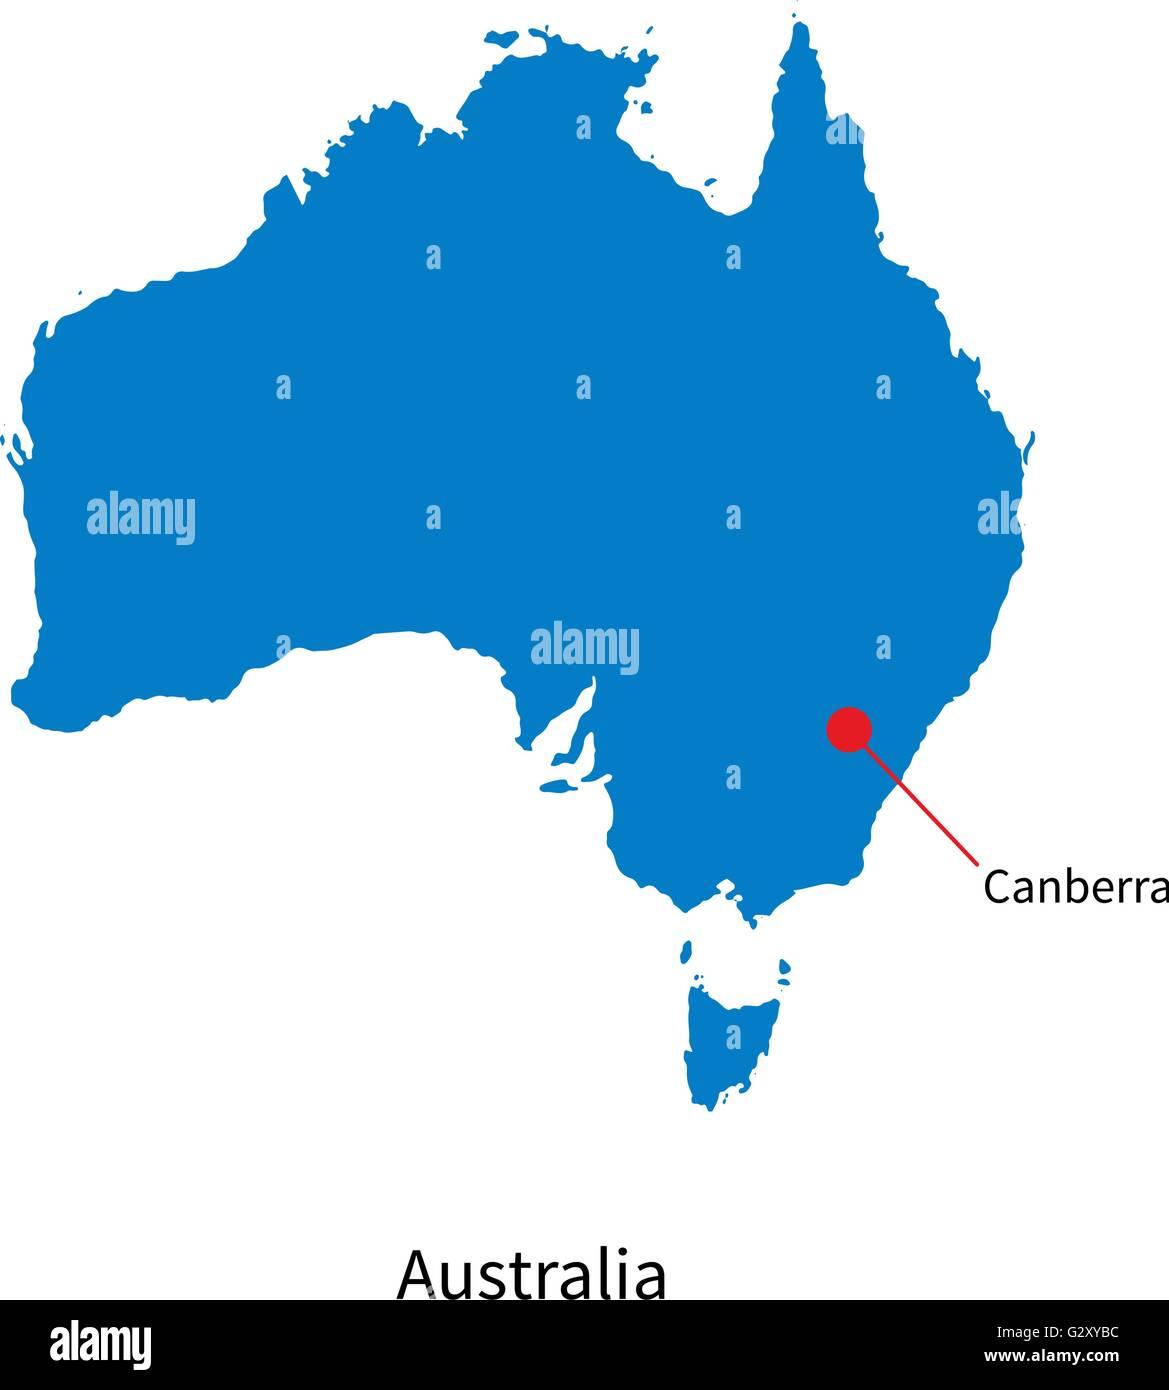 Australia Capital Map My blog